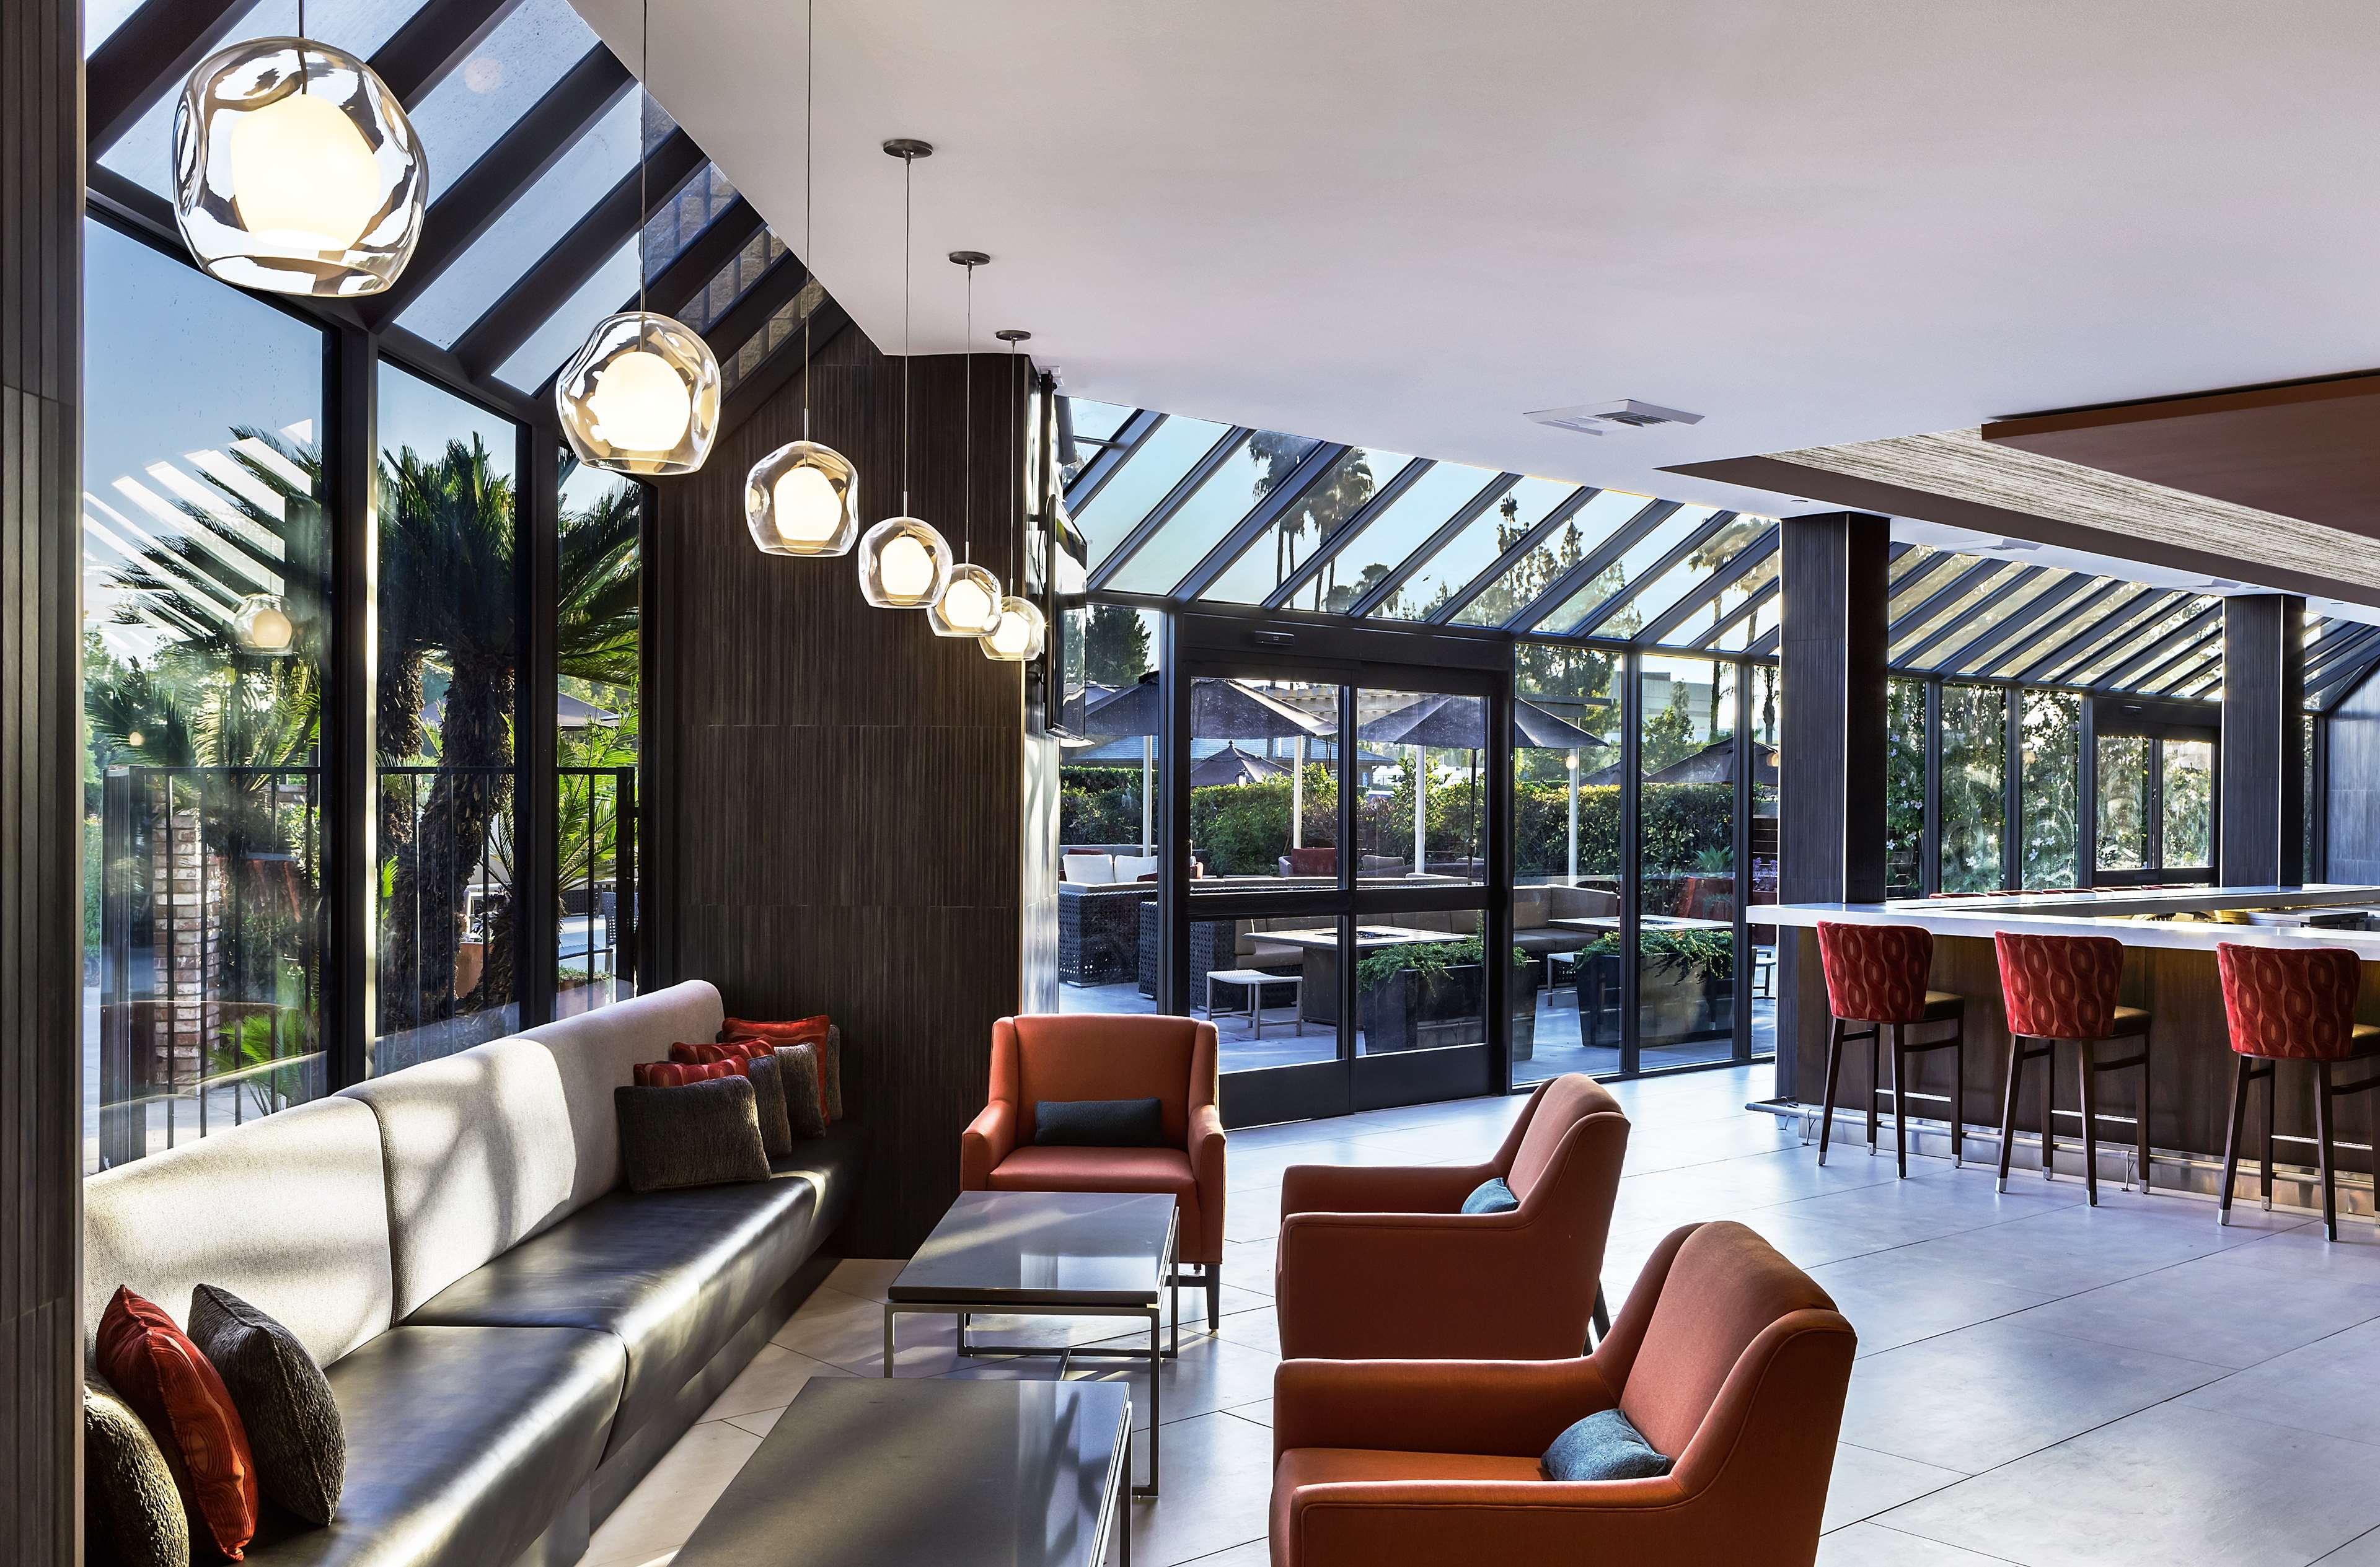 DoubleTree by Hilton Hotel San Bernardino image 48